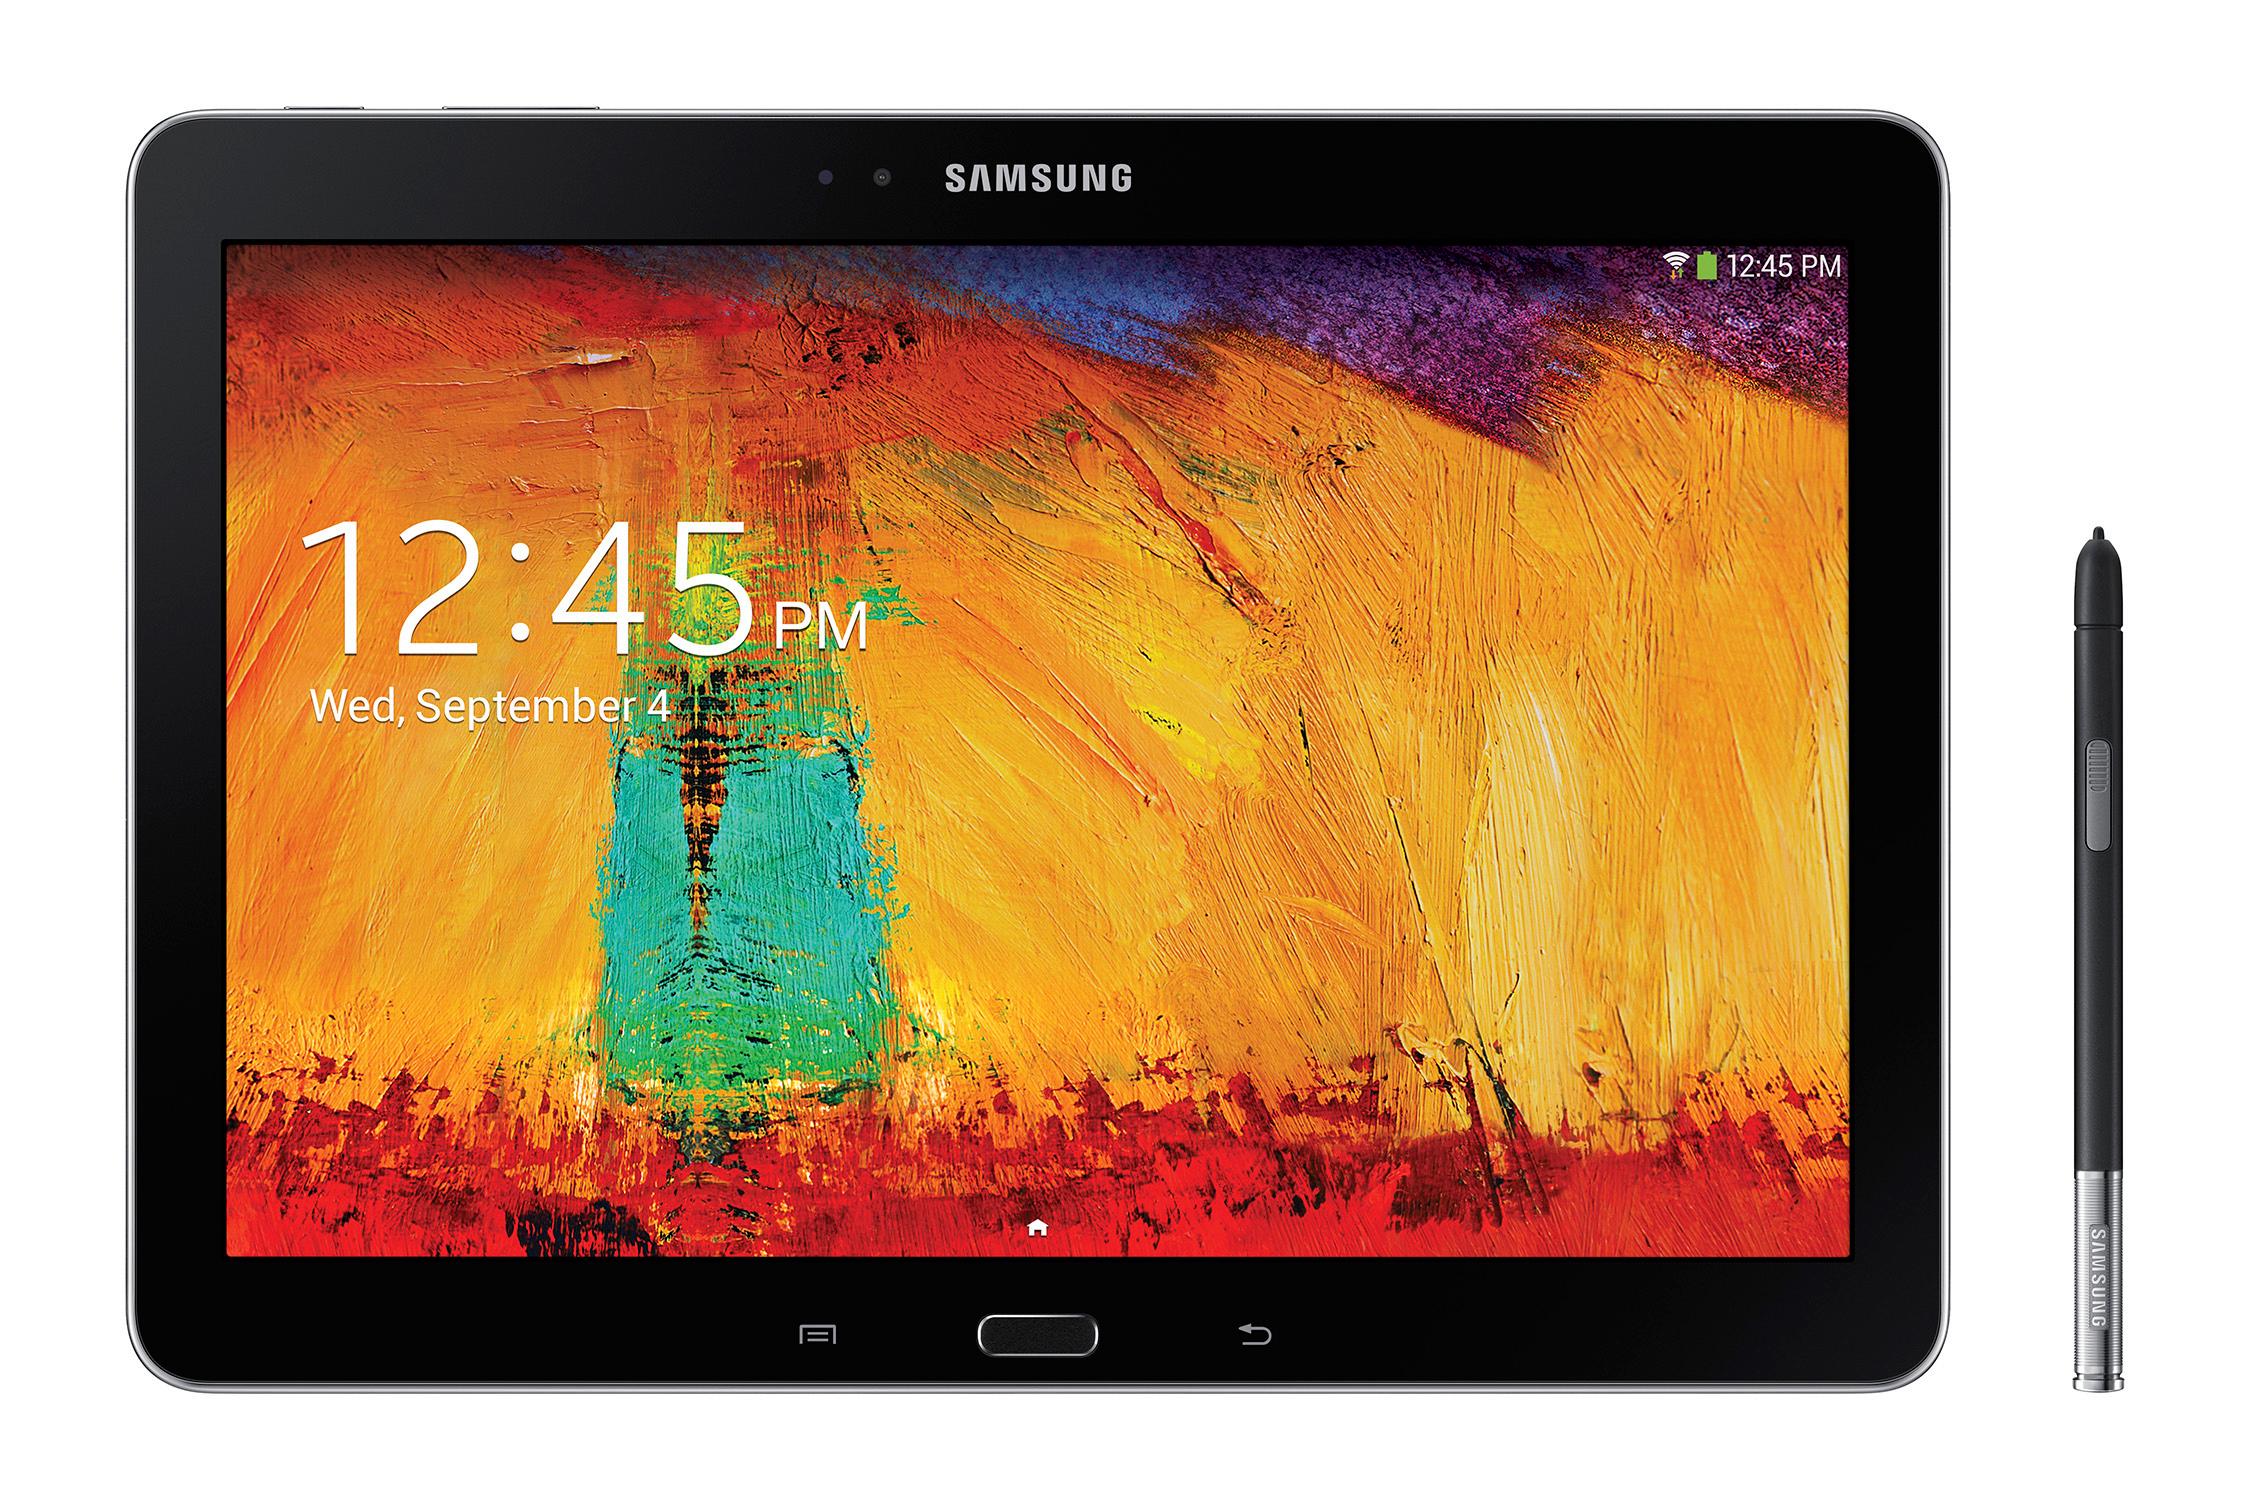 Samsung Galaxy Note 10.1 - 2014 Edition